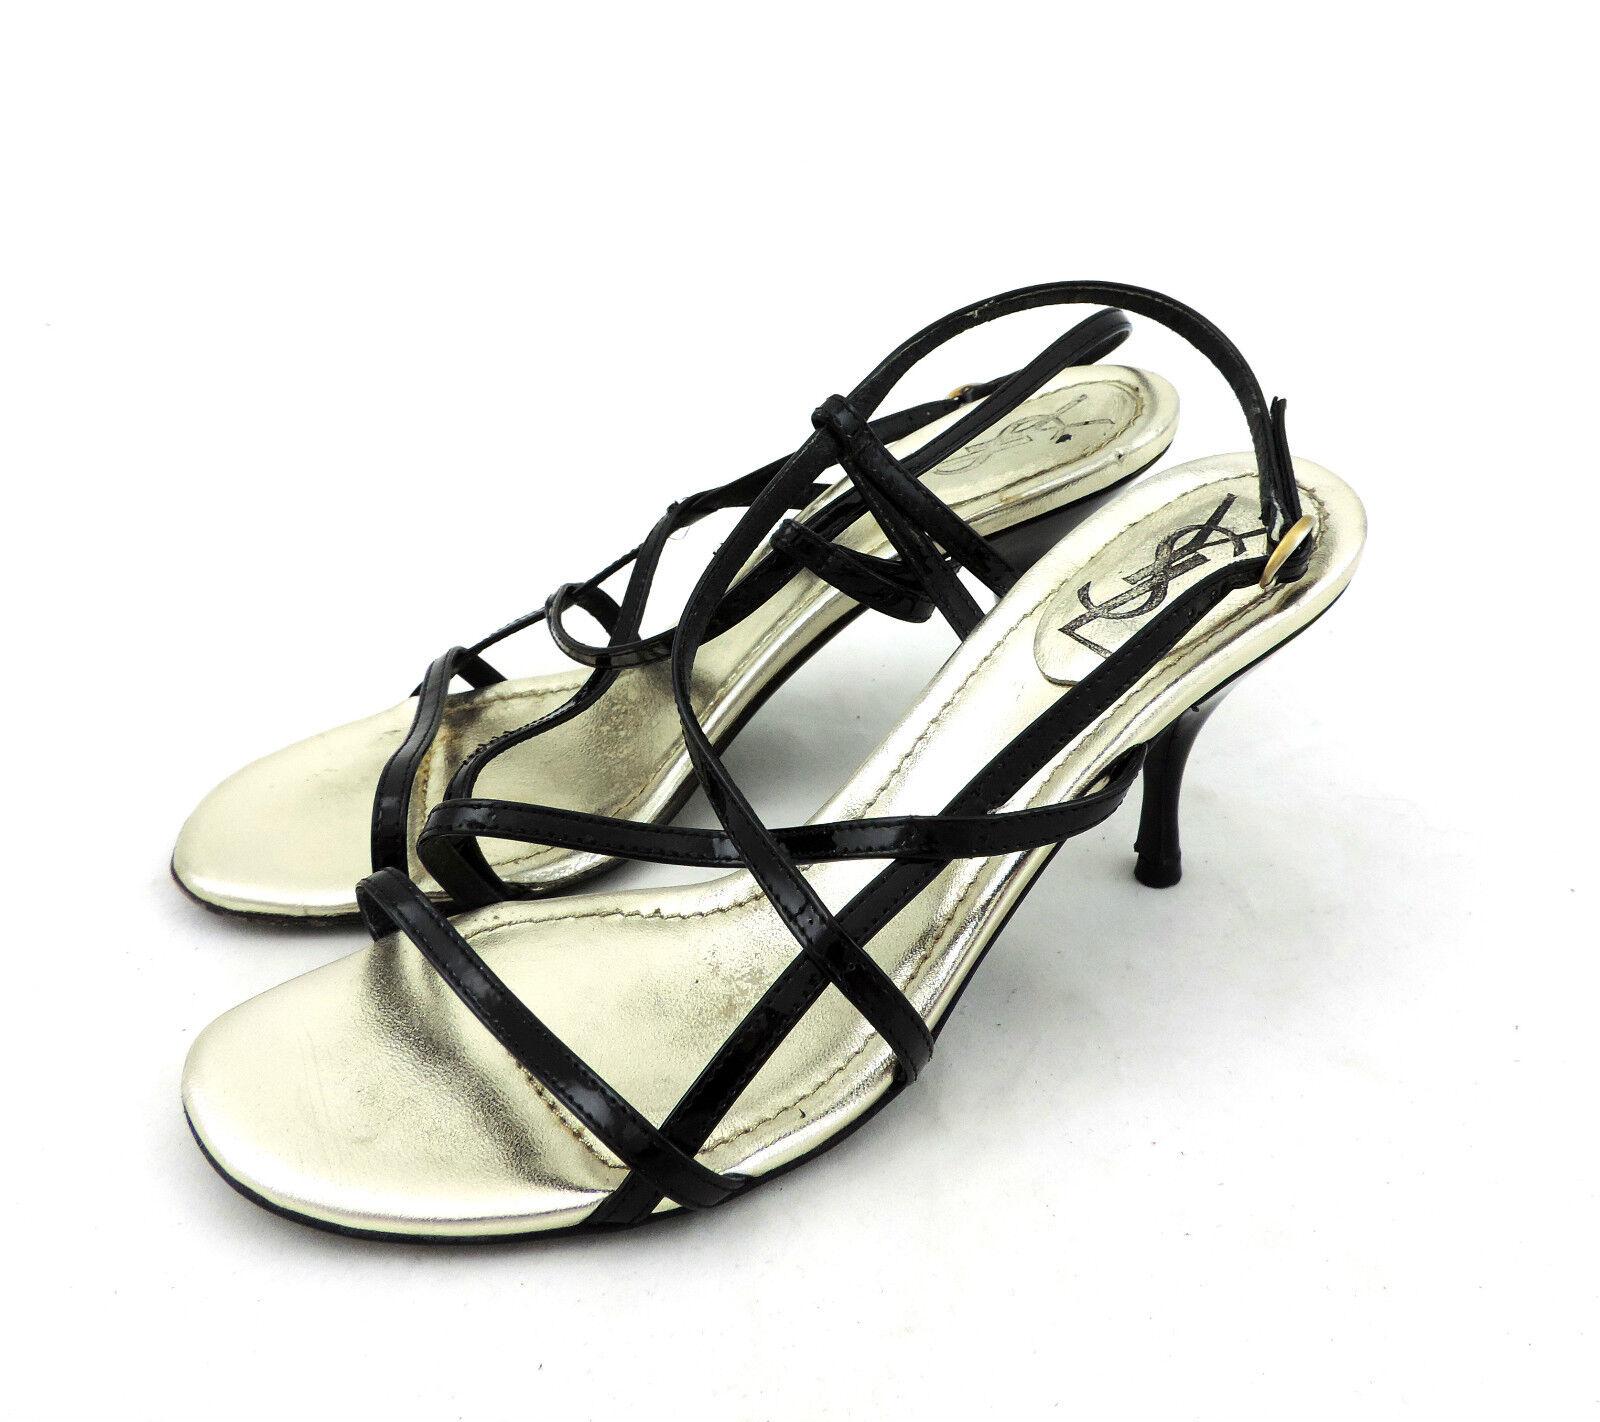 Yves schwarz Saint Laurent Sandale 36 schwarz Yves high heels Leder sandals 5d64d3